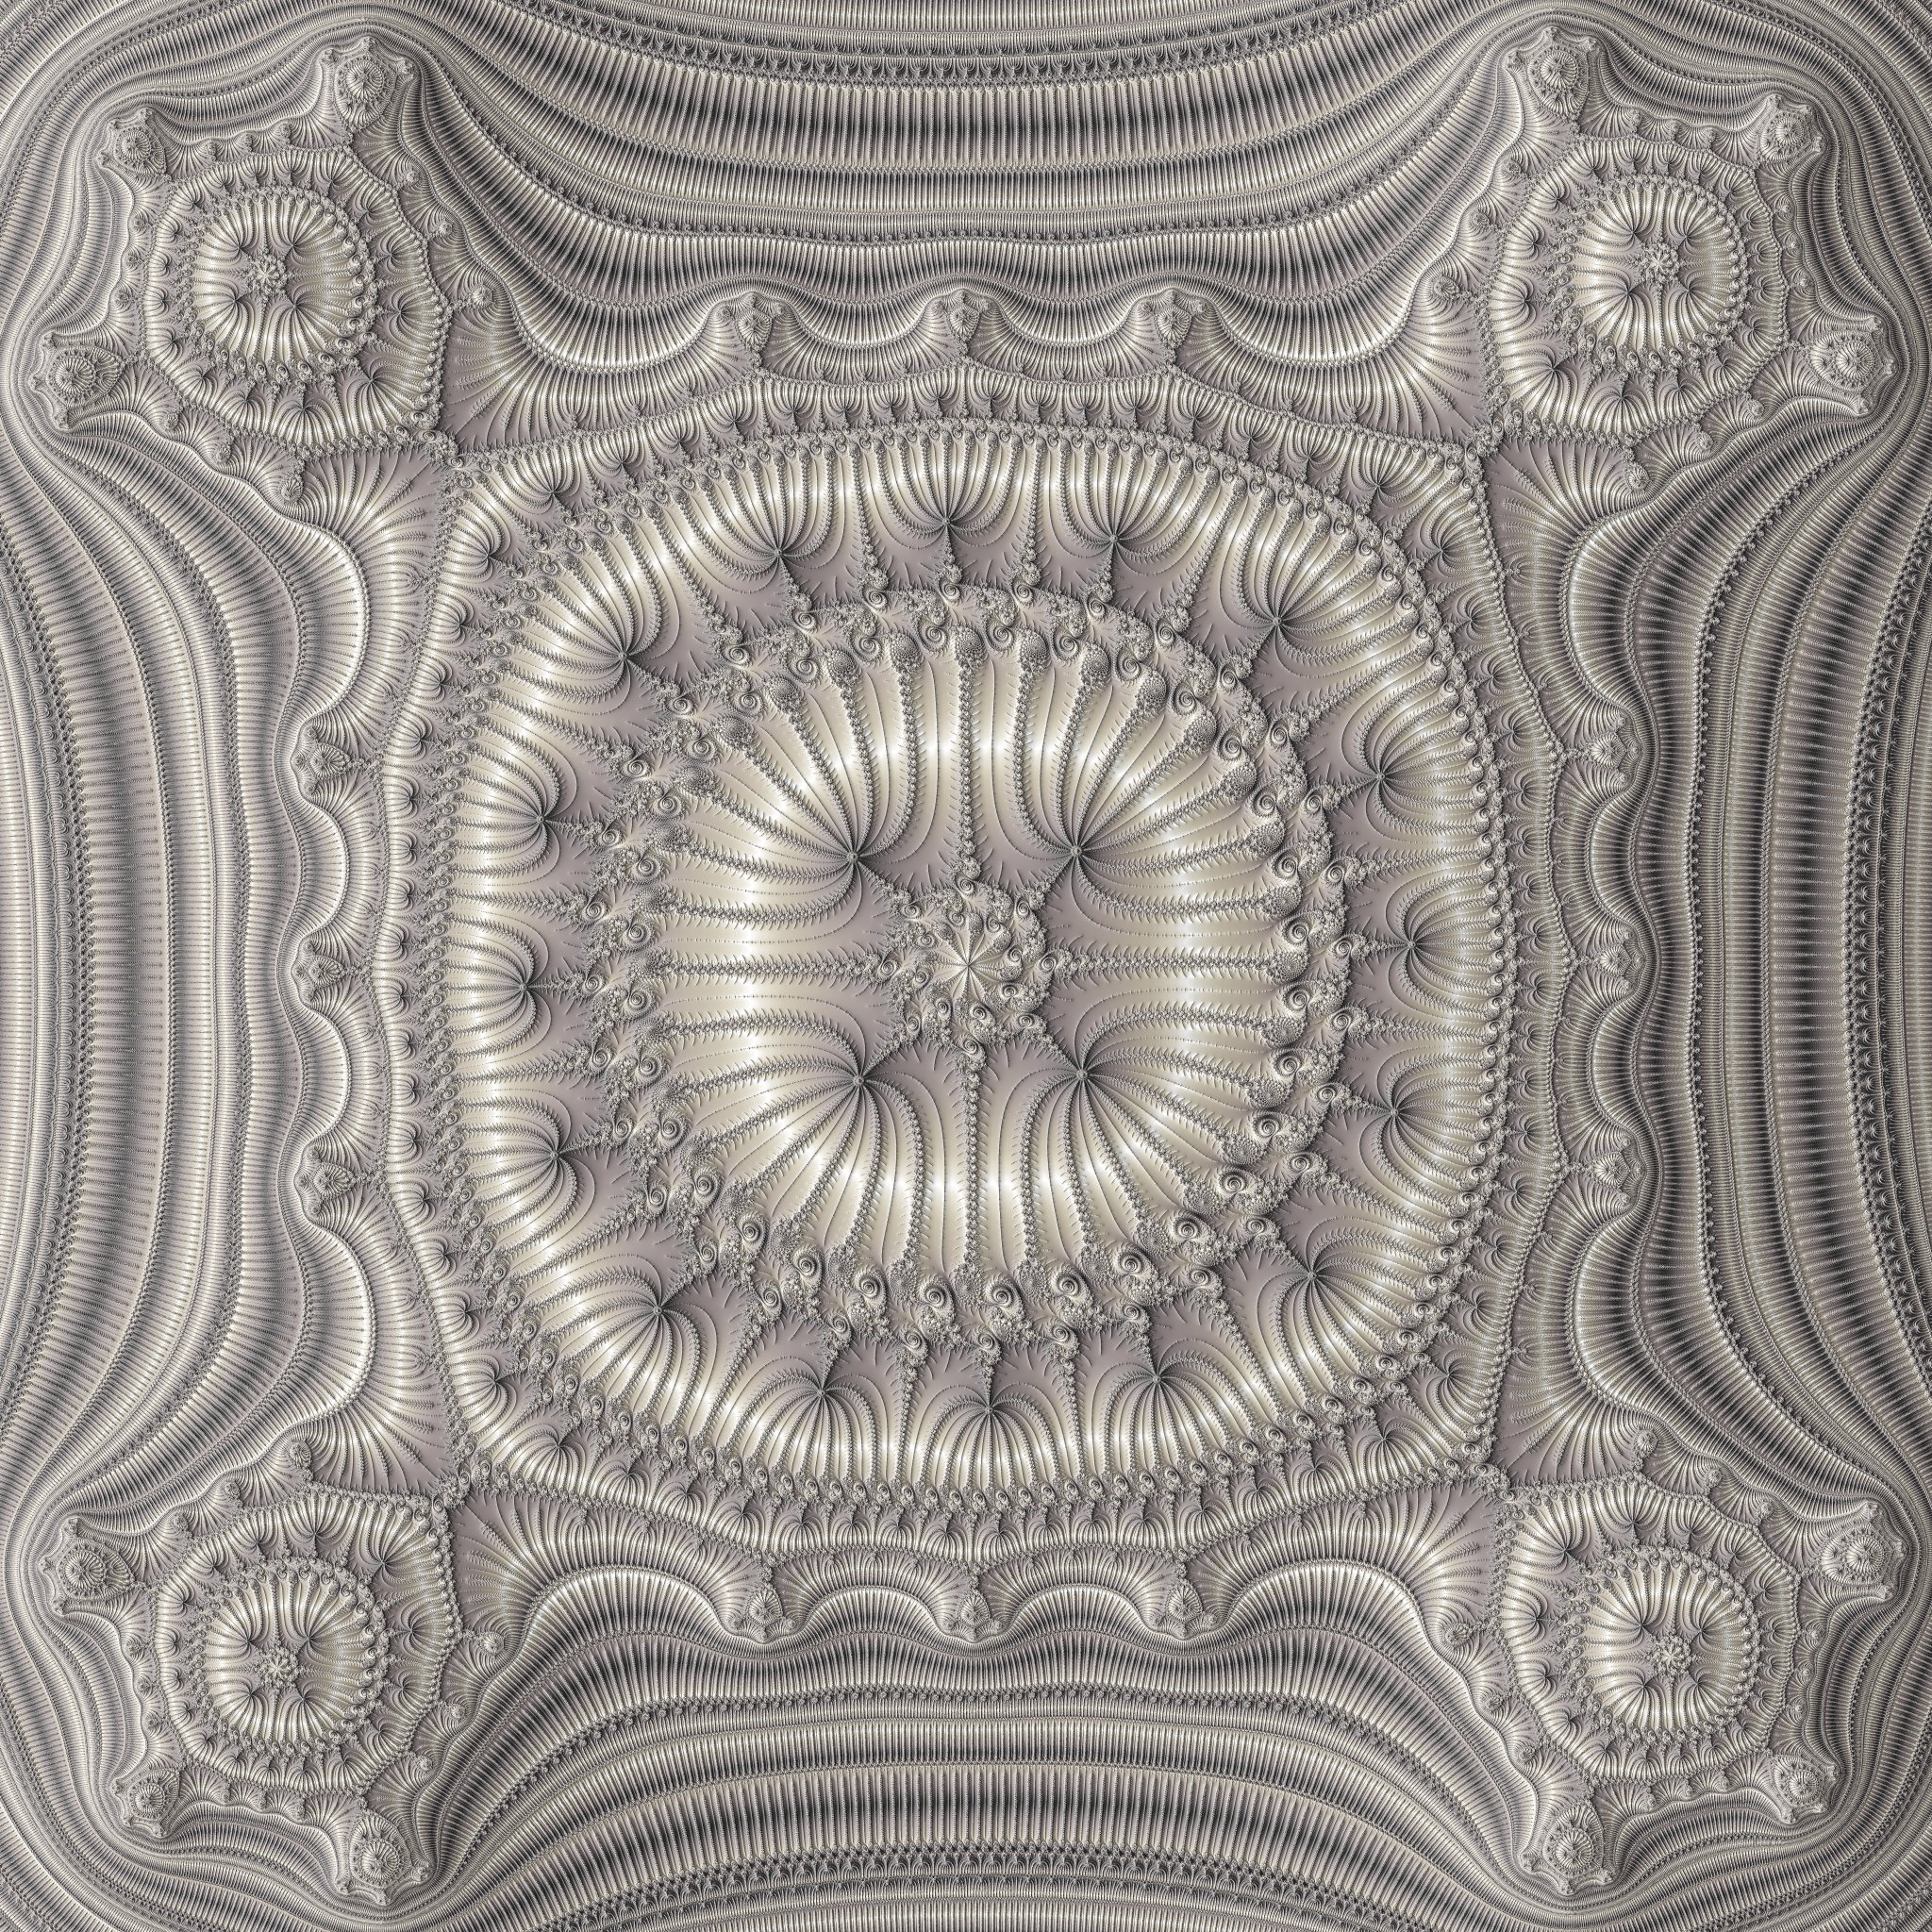 Olbaid ST's Deep Mandelbrot Set #043 by bryceguy72